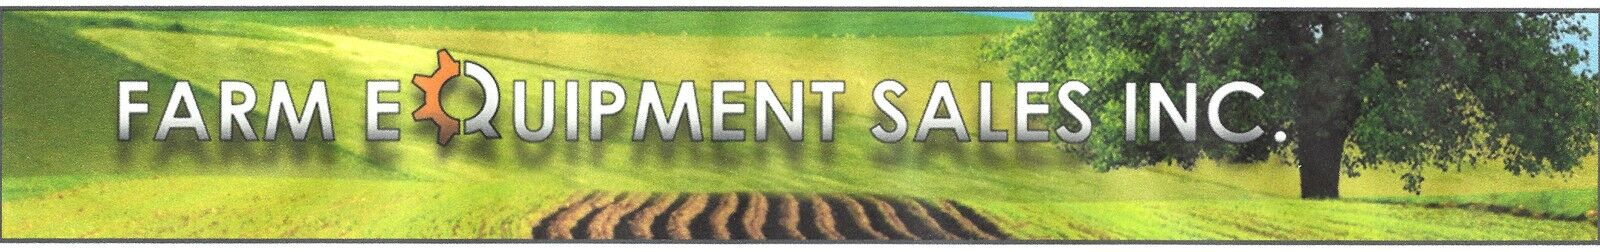 Farm Equipment Sales, Inc.